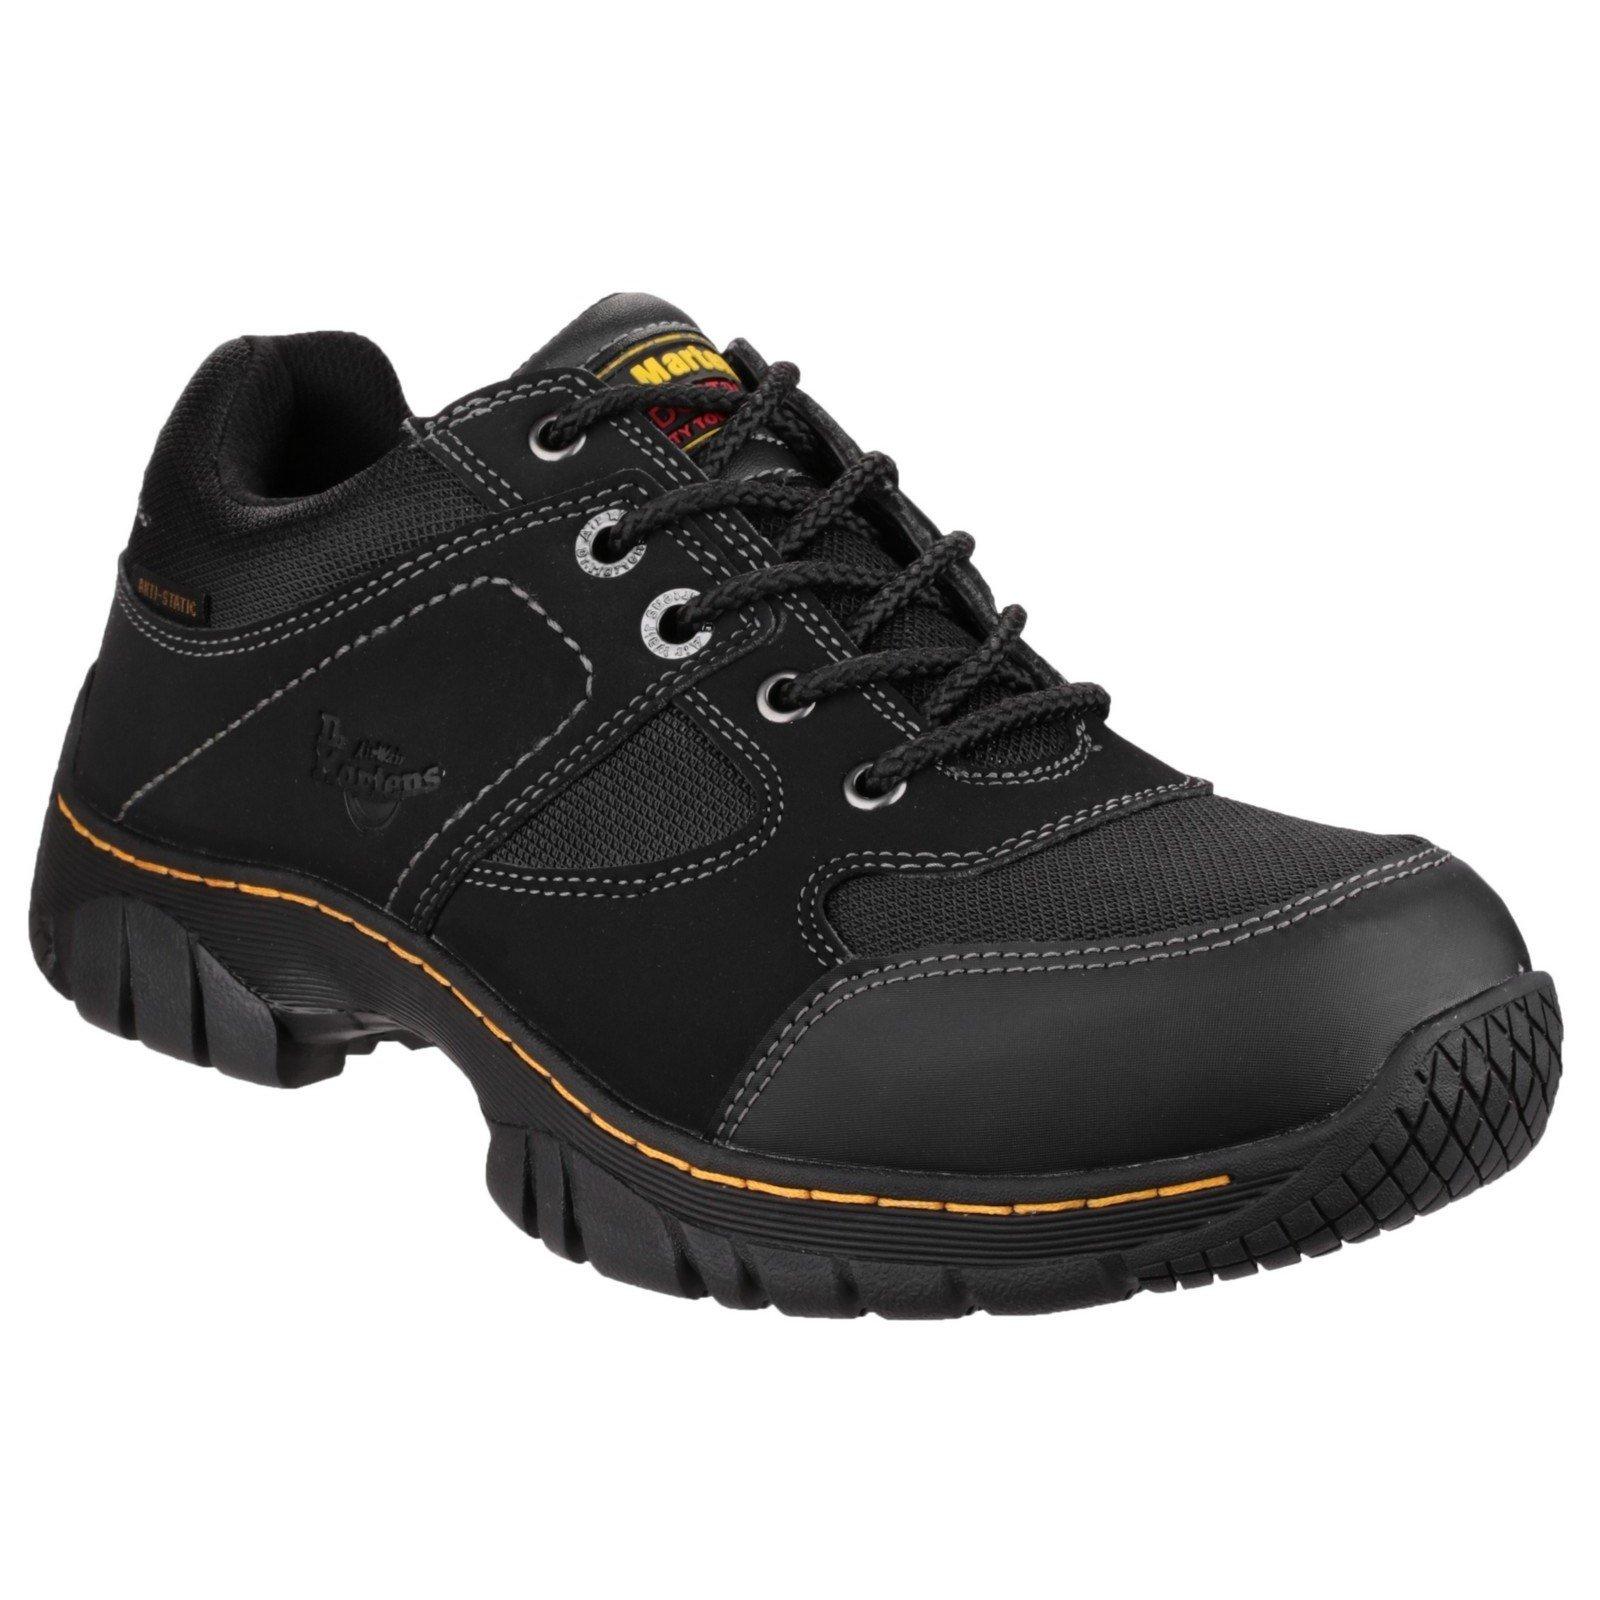 Dr Martens Unisex Gunaldo Safety Trainer Black 21648 - Black 6